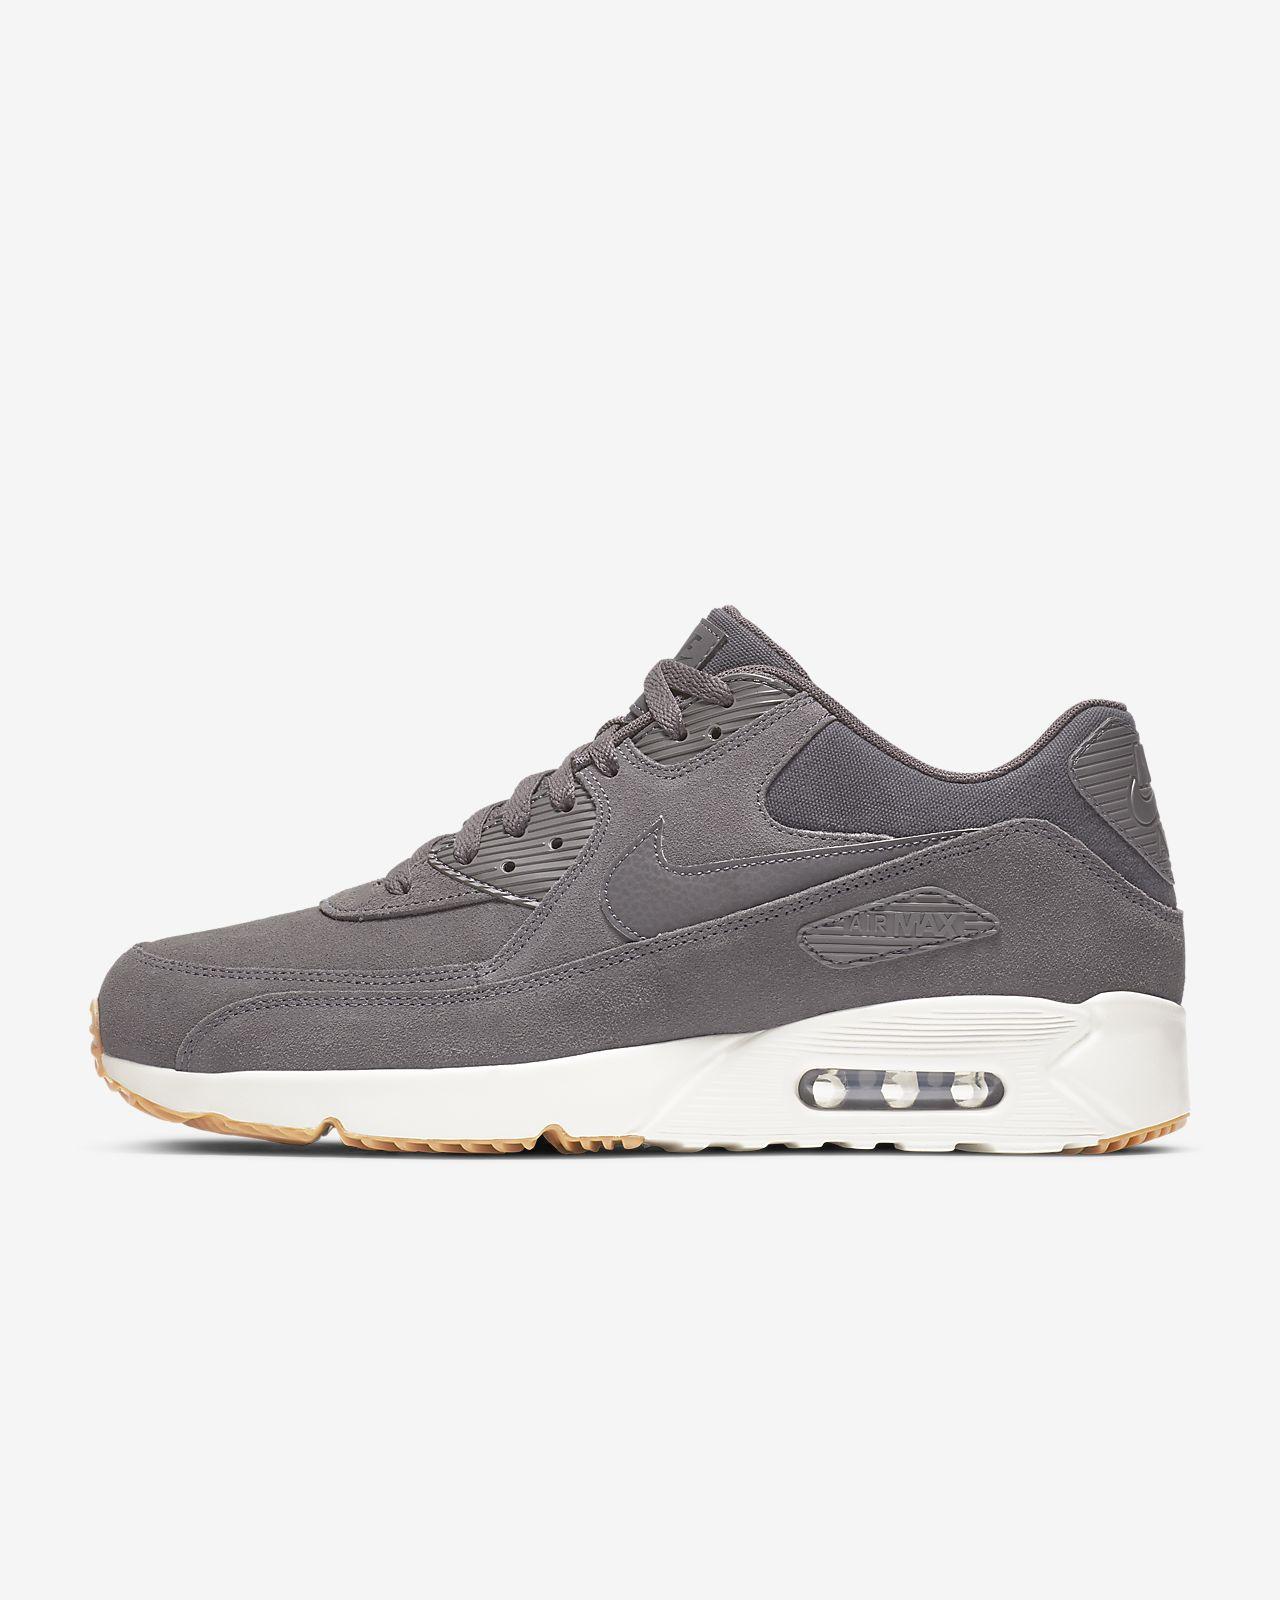 timeless design b5f6e eca6d ... Nike Air Max 90 Ultra 2.0-sko til mænd